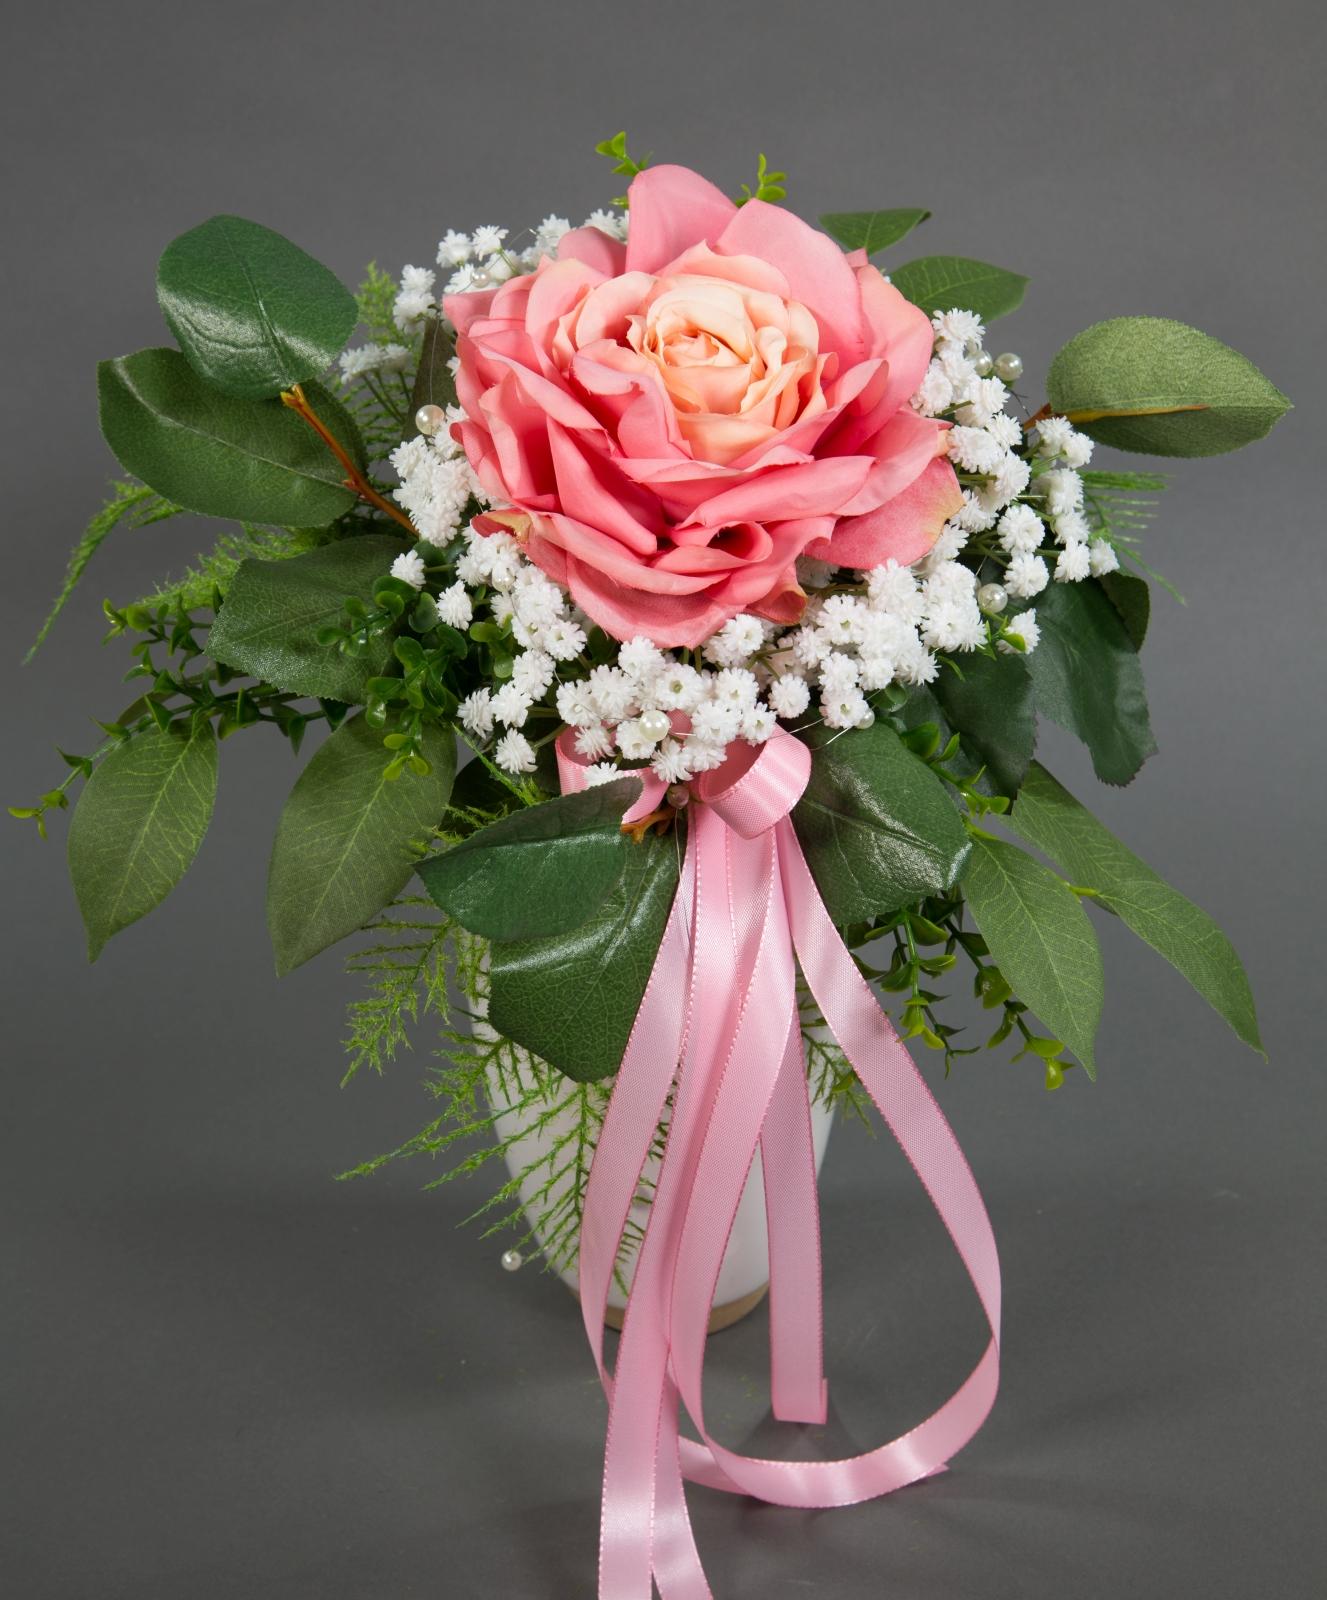 strau mit gro er rose 36x25cm rosa kunstblumen k nstlicher strau blumenstrau rosenstrau. Black Bedroom Furniture Sets. Home Design Ideas